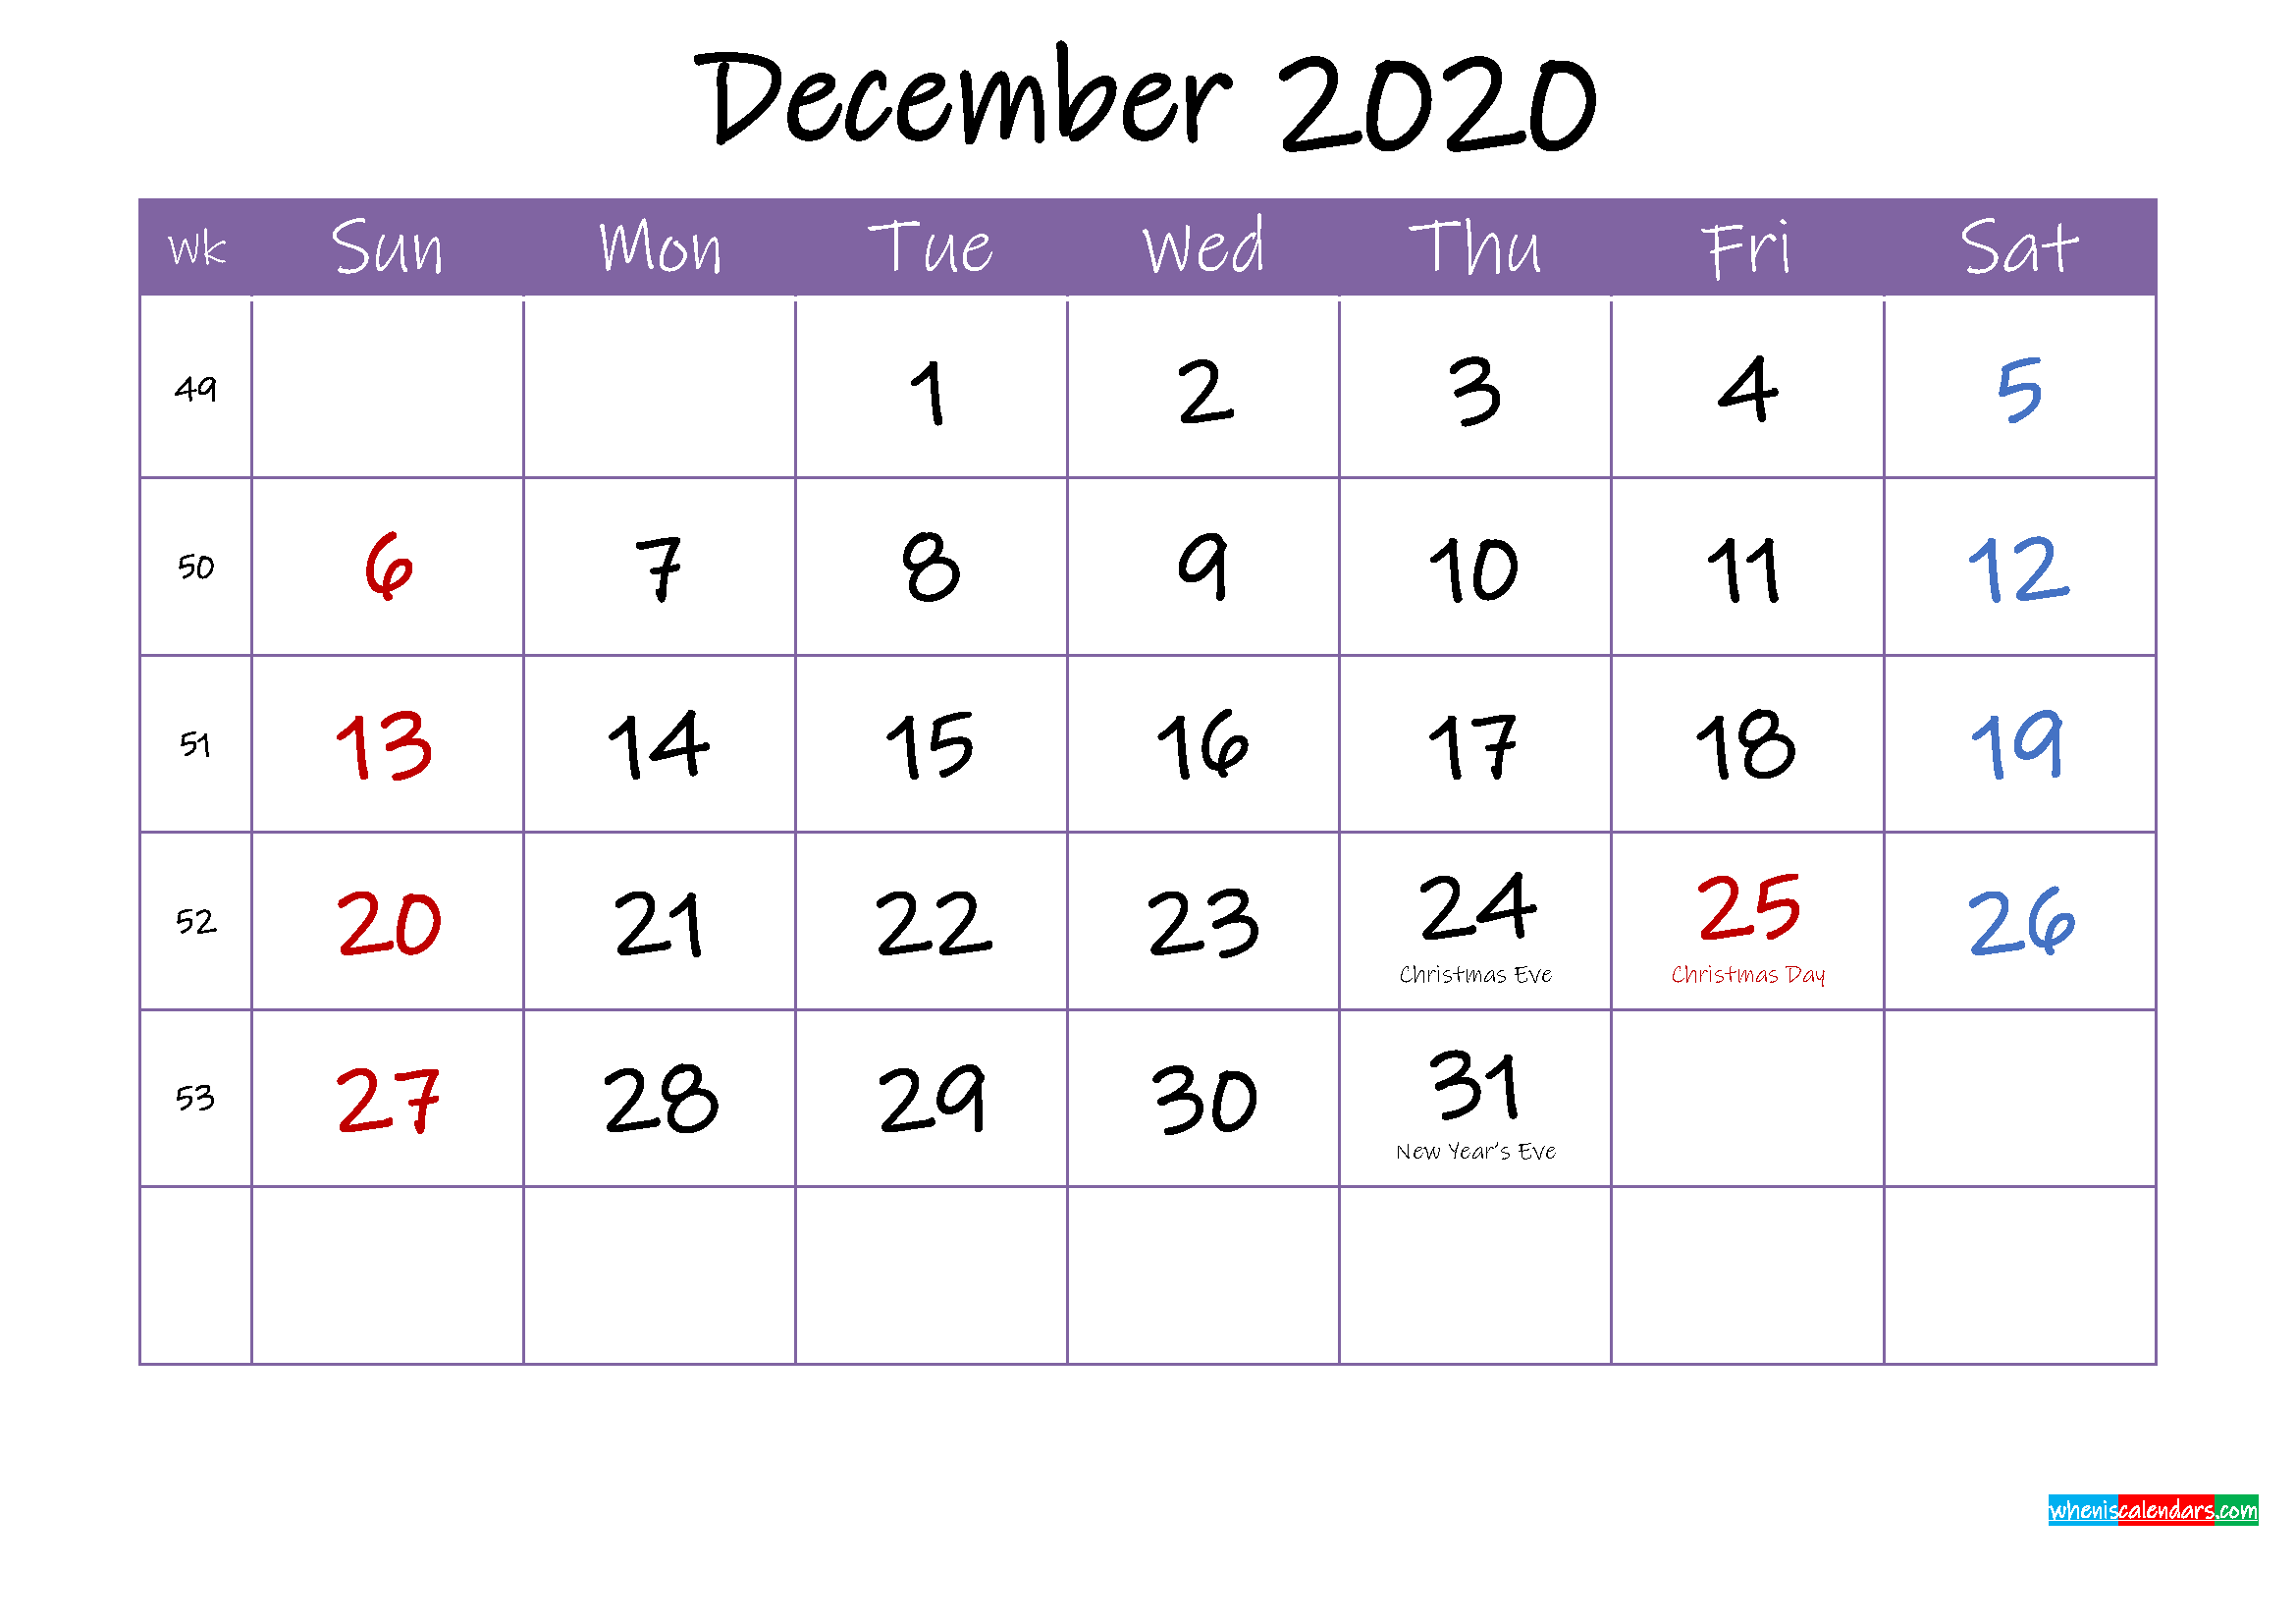 December 2020 Calendar with Holidays Printable